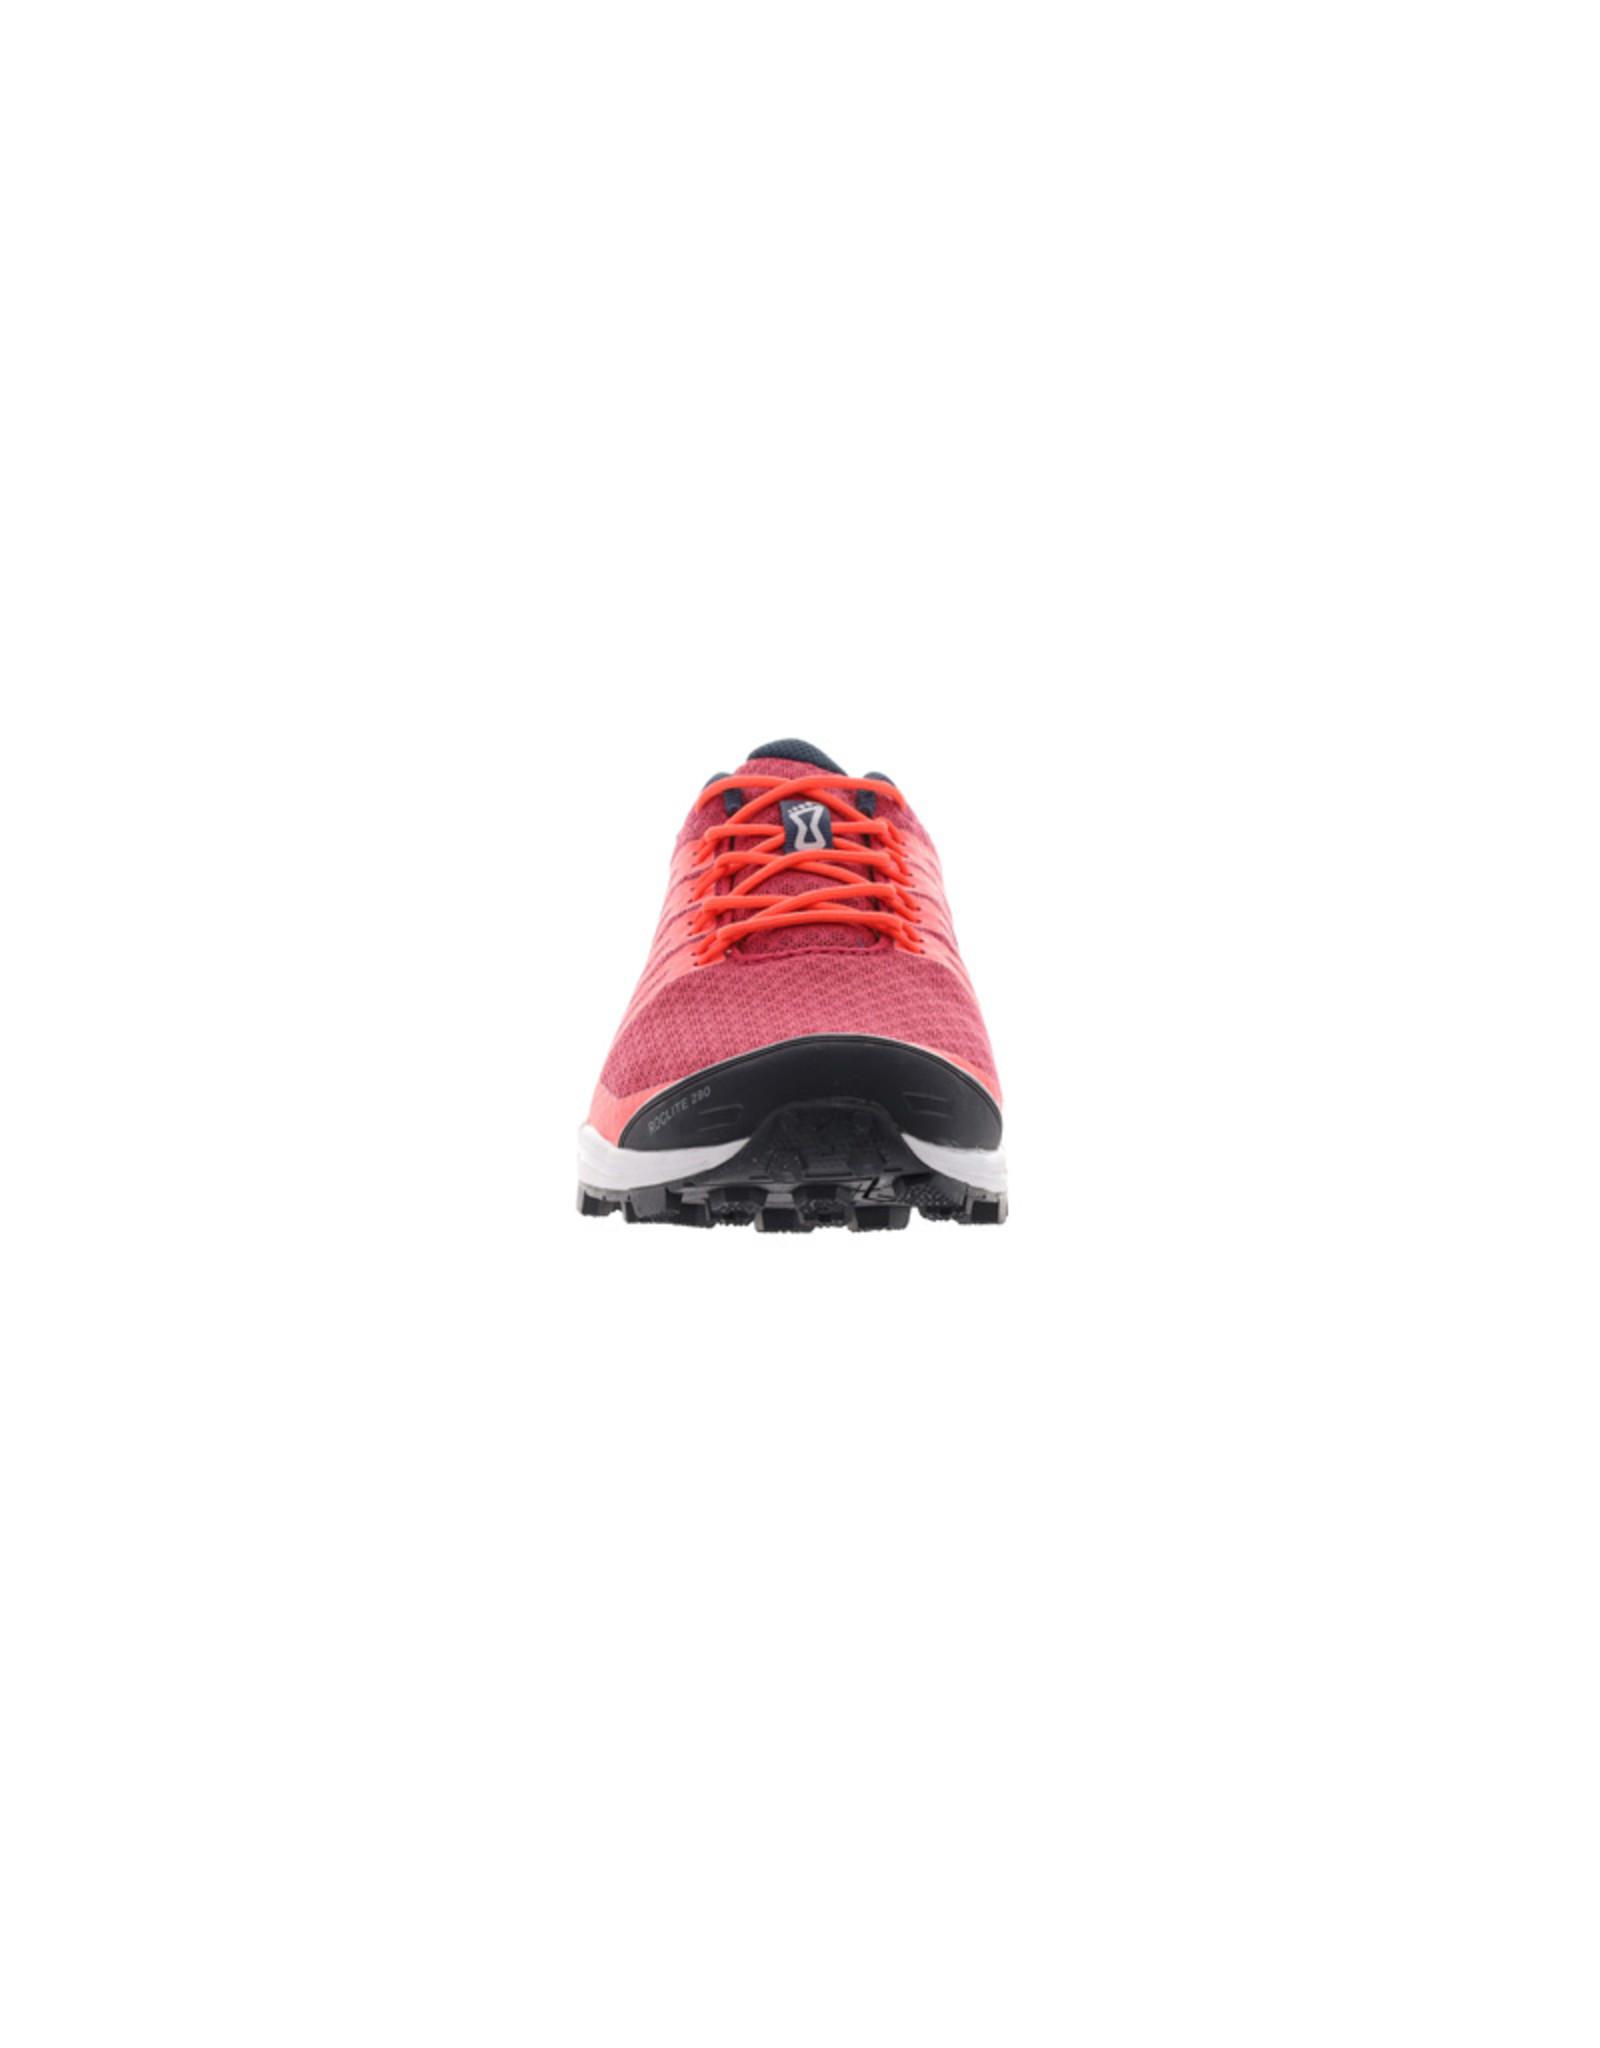 Inov-8 Roclite G 290 Trailrunning Schoen - Paars/Roze